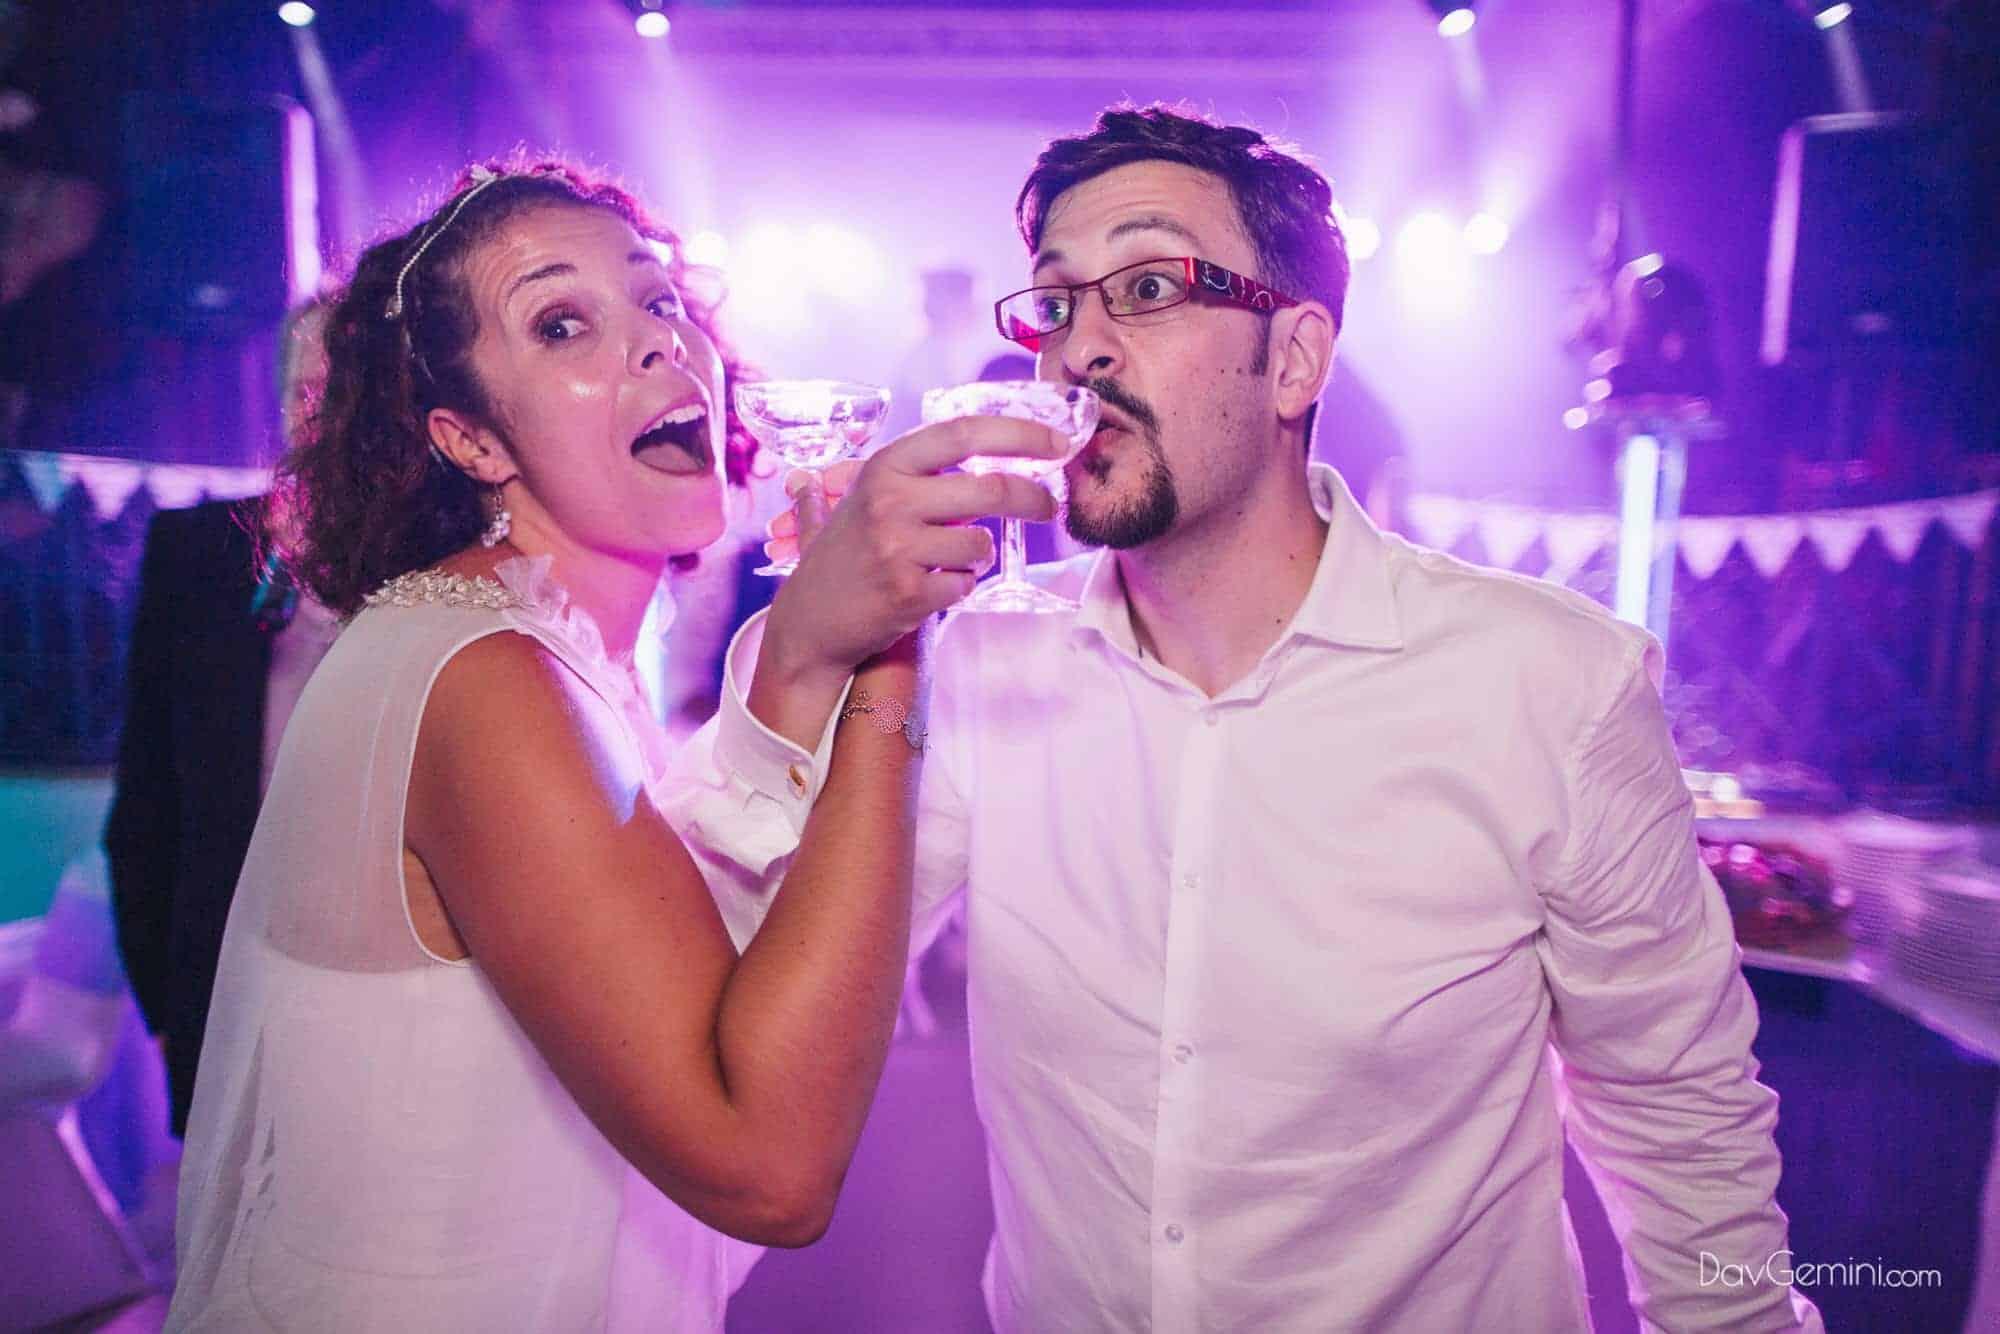 reportage de mariage moulin de gueliz, photographe mariage 77